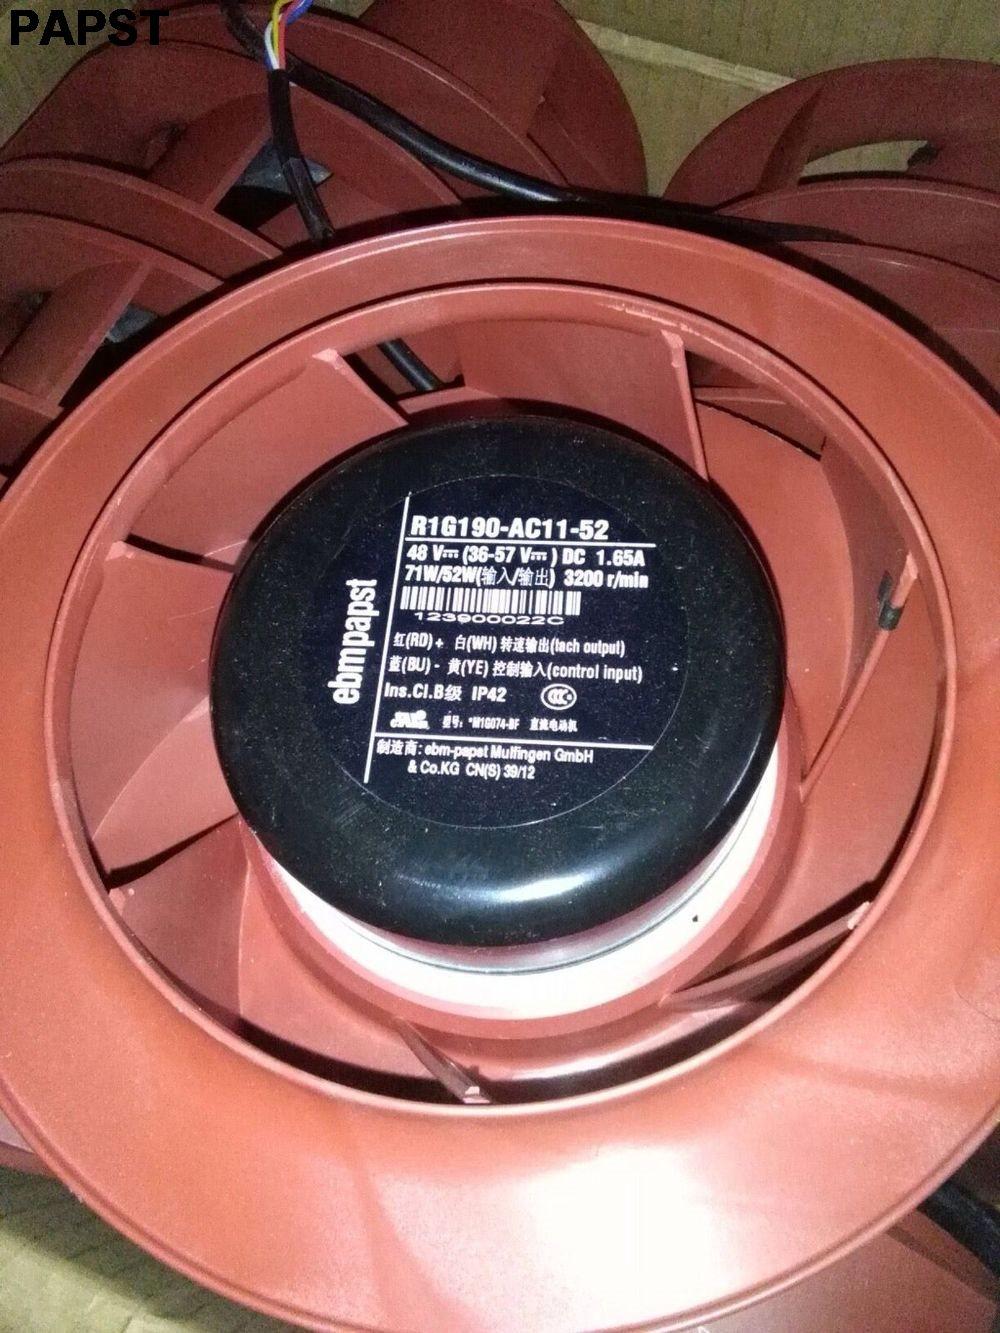 papst R1G190-AC11-52 DC48V 1.65A 3200RPM IP42 Blower